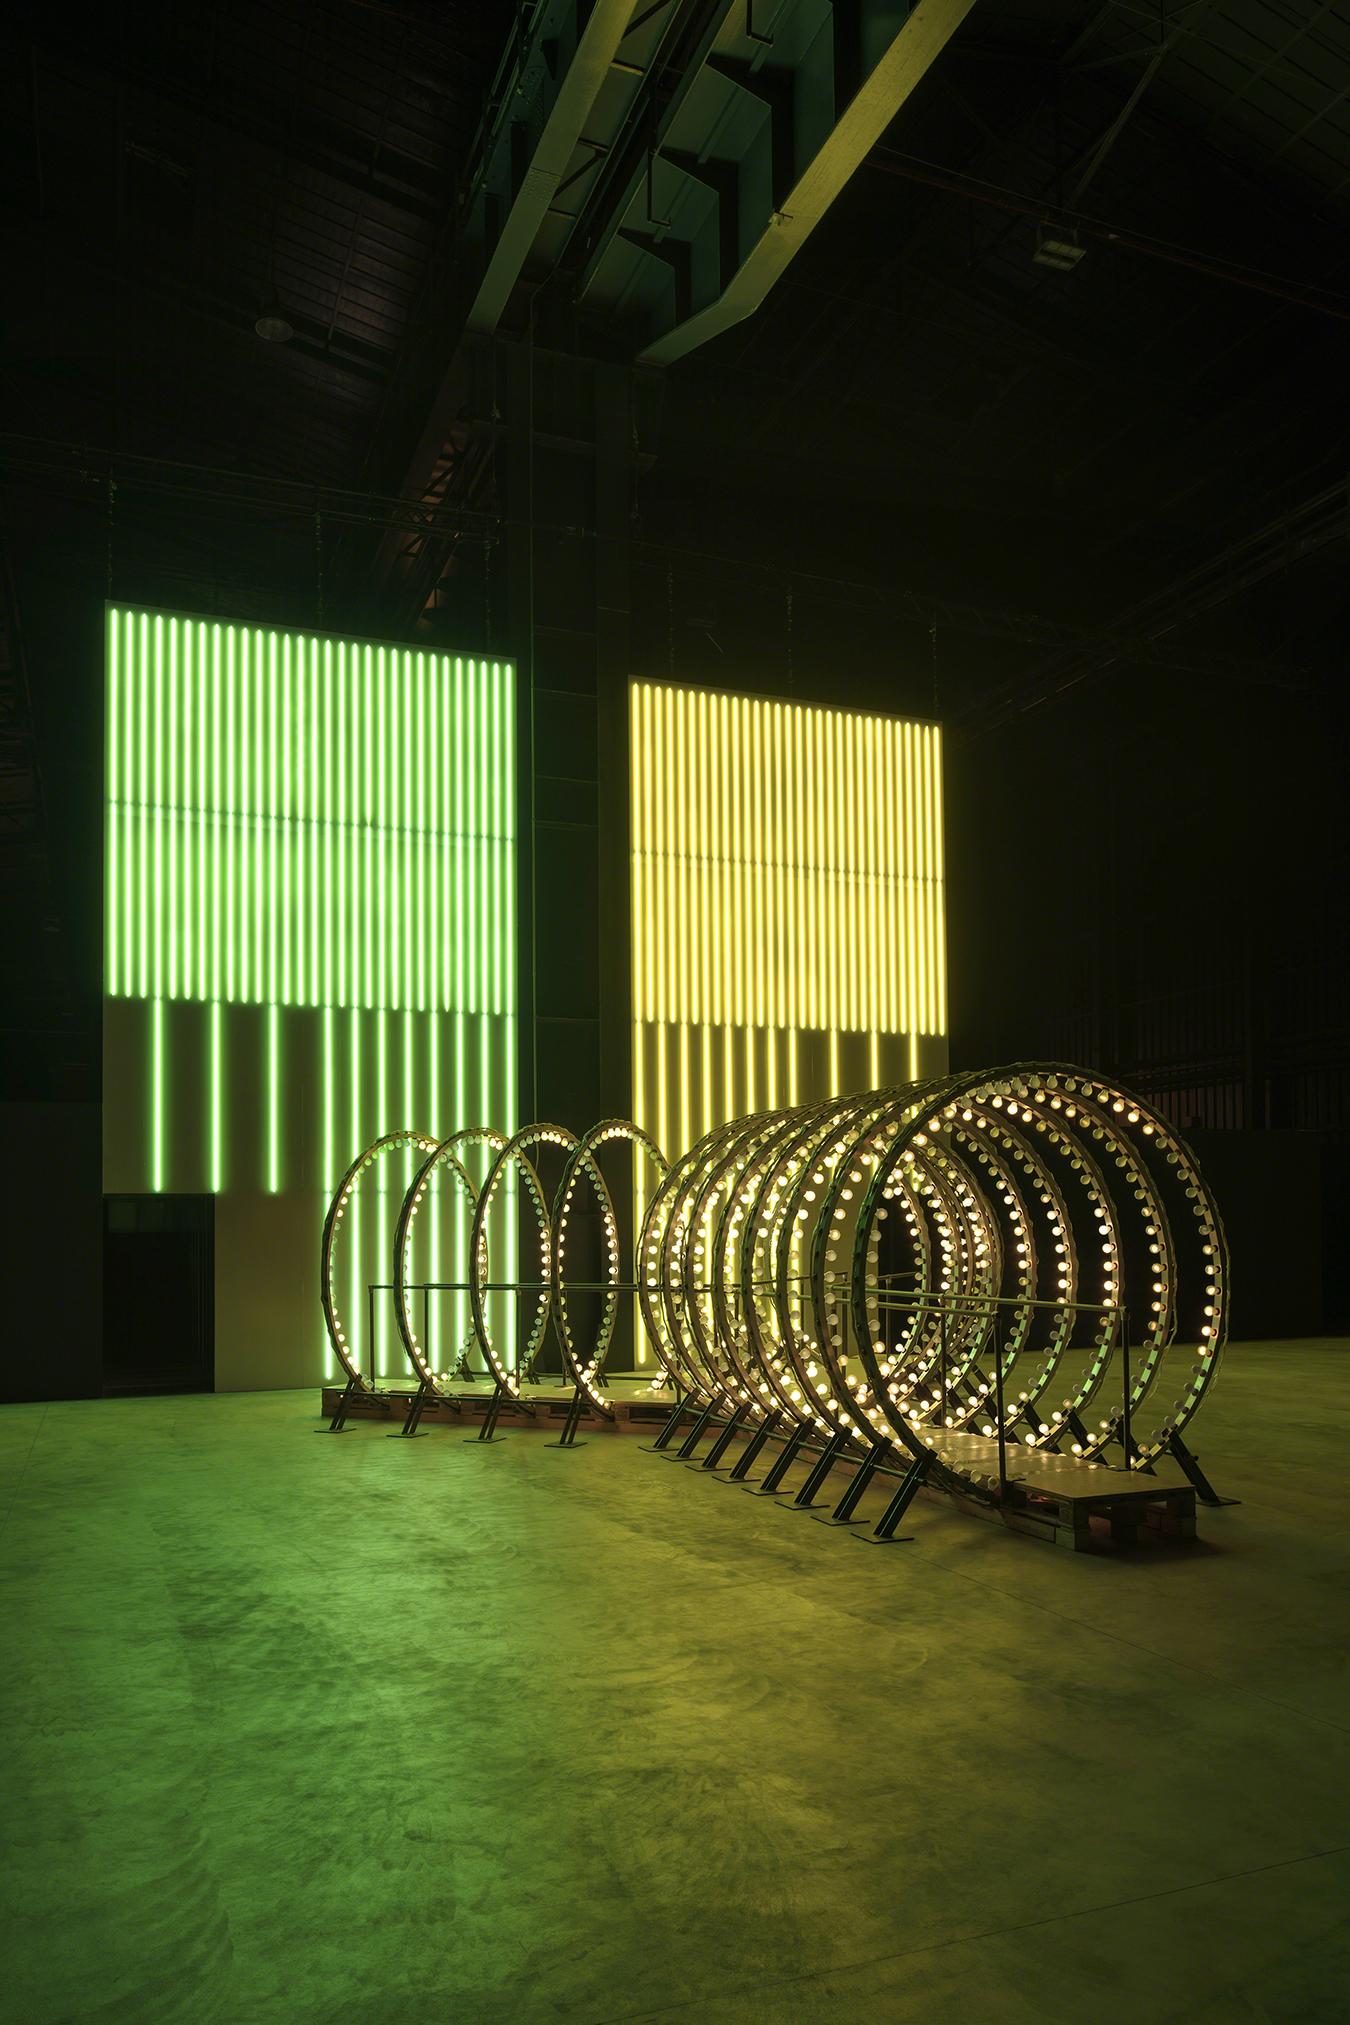 Carsten Höller, Y, 2003; Divisions Wall, 2016 (Courtesy of the artist and Pirelli HangarBicocca, Milan. Photo: © Attilio Maranzano)